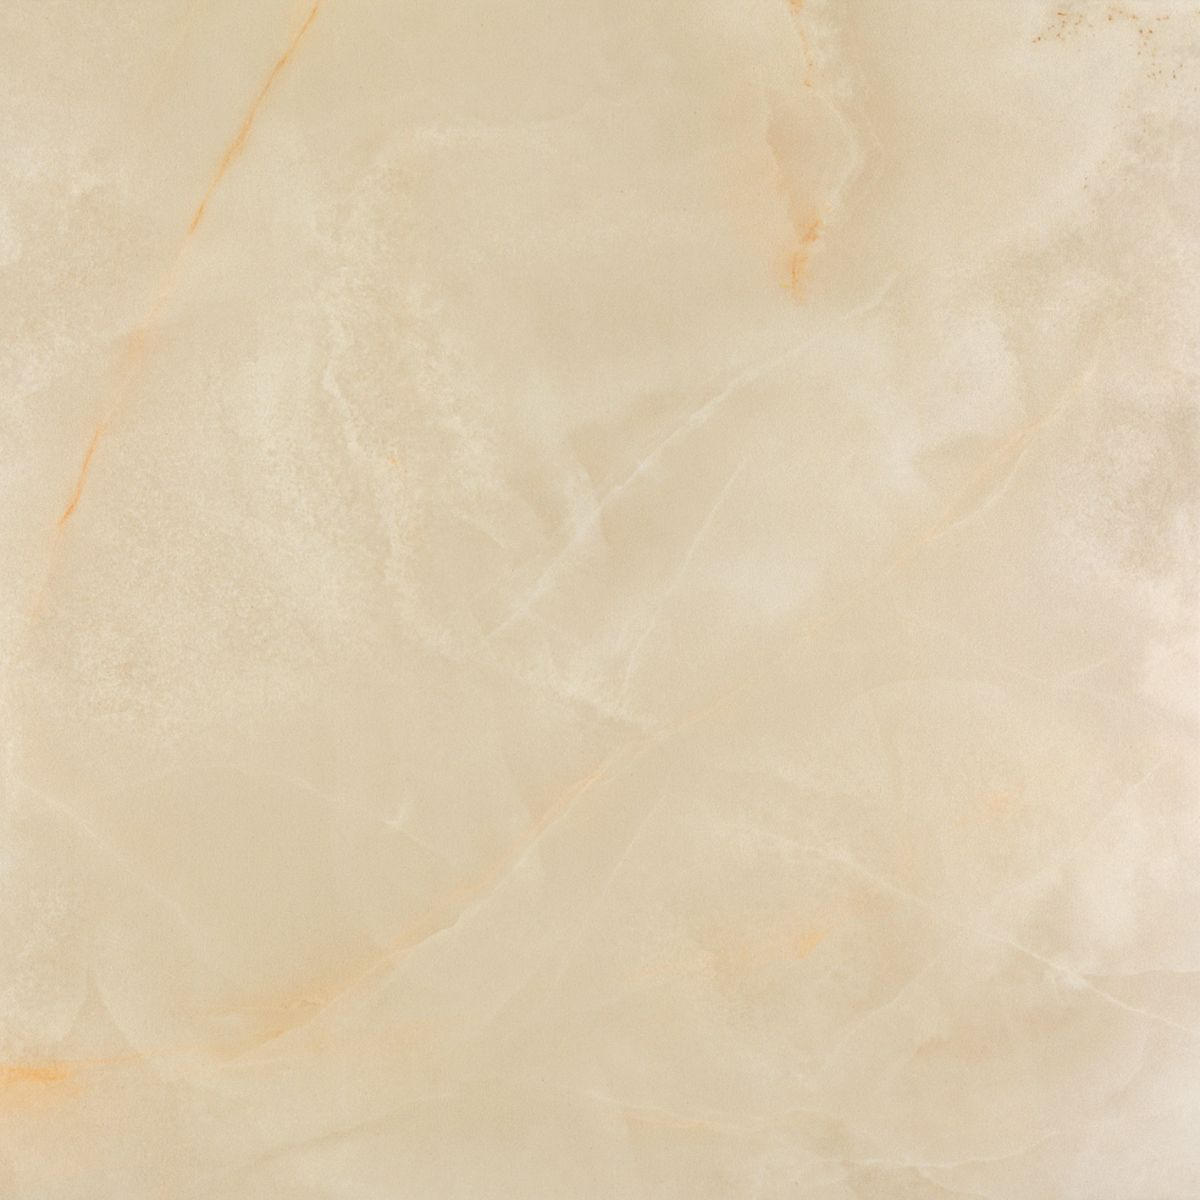 Lazio beige - dlaždice rektifikovaná 59,3x59,3 béžová